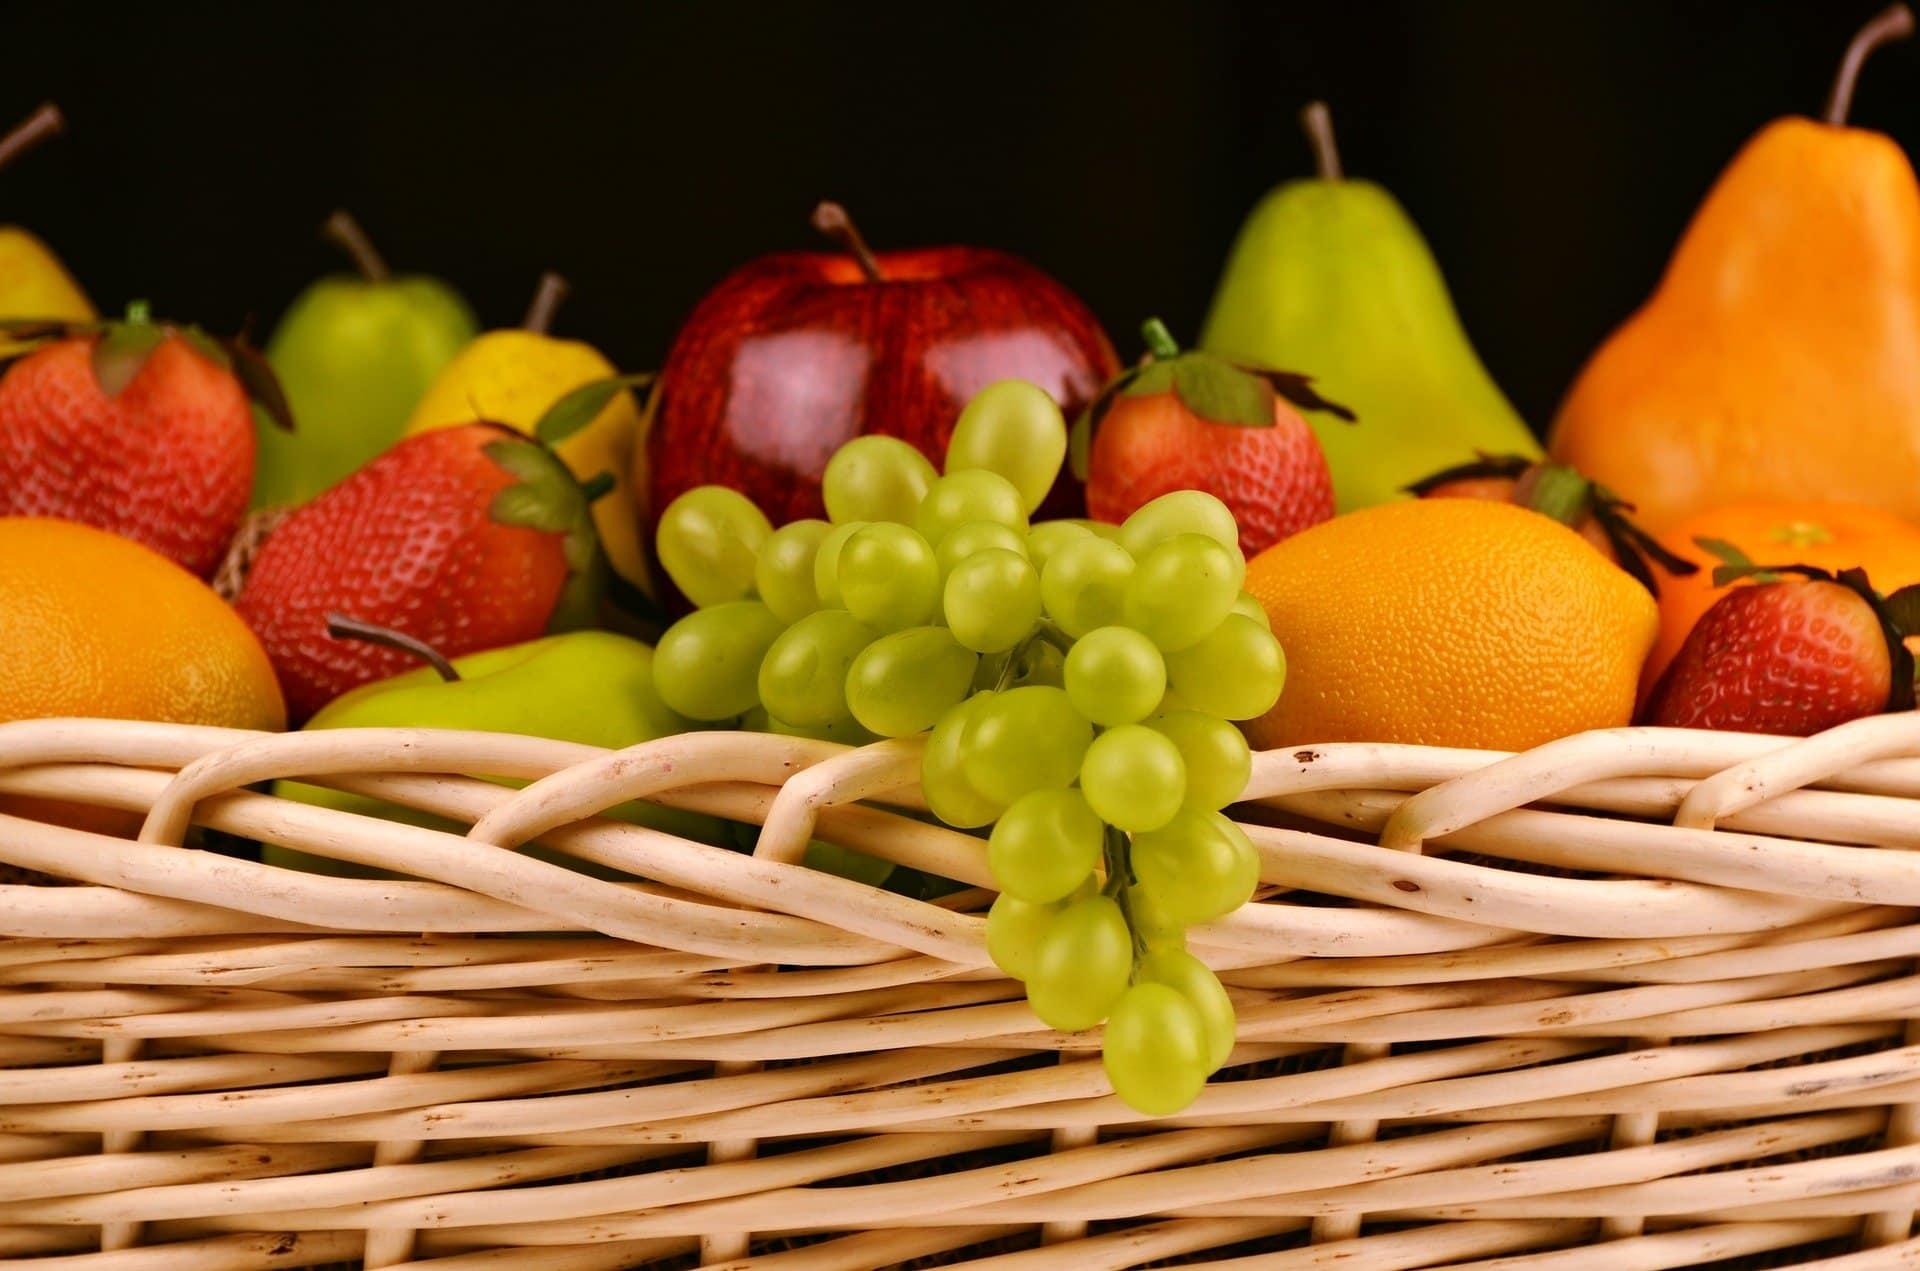 fruitmachines